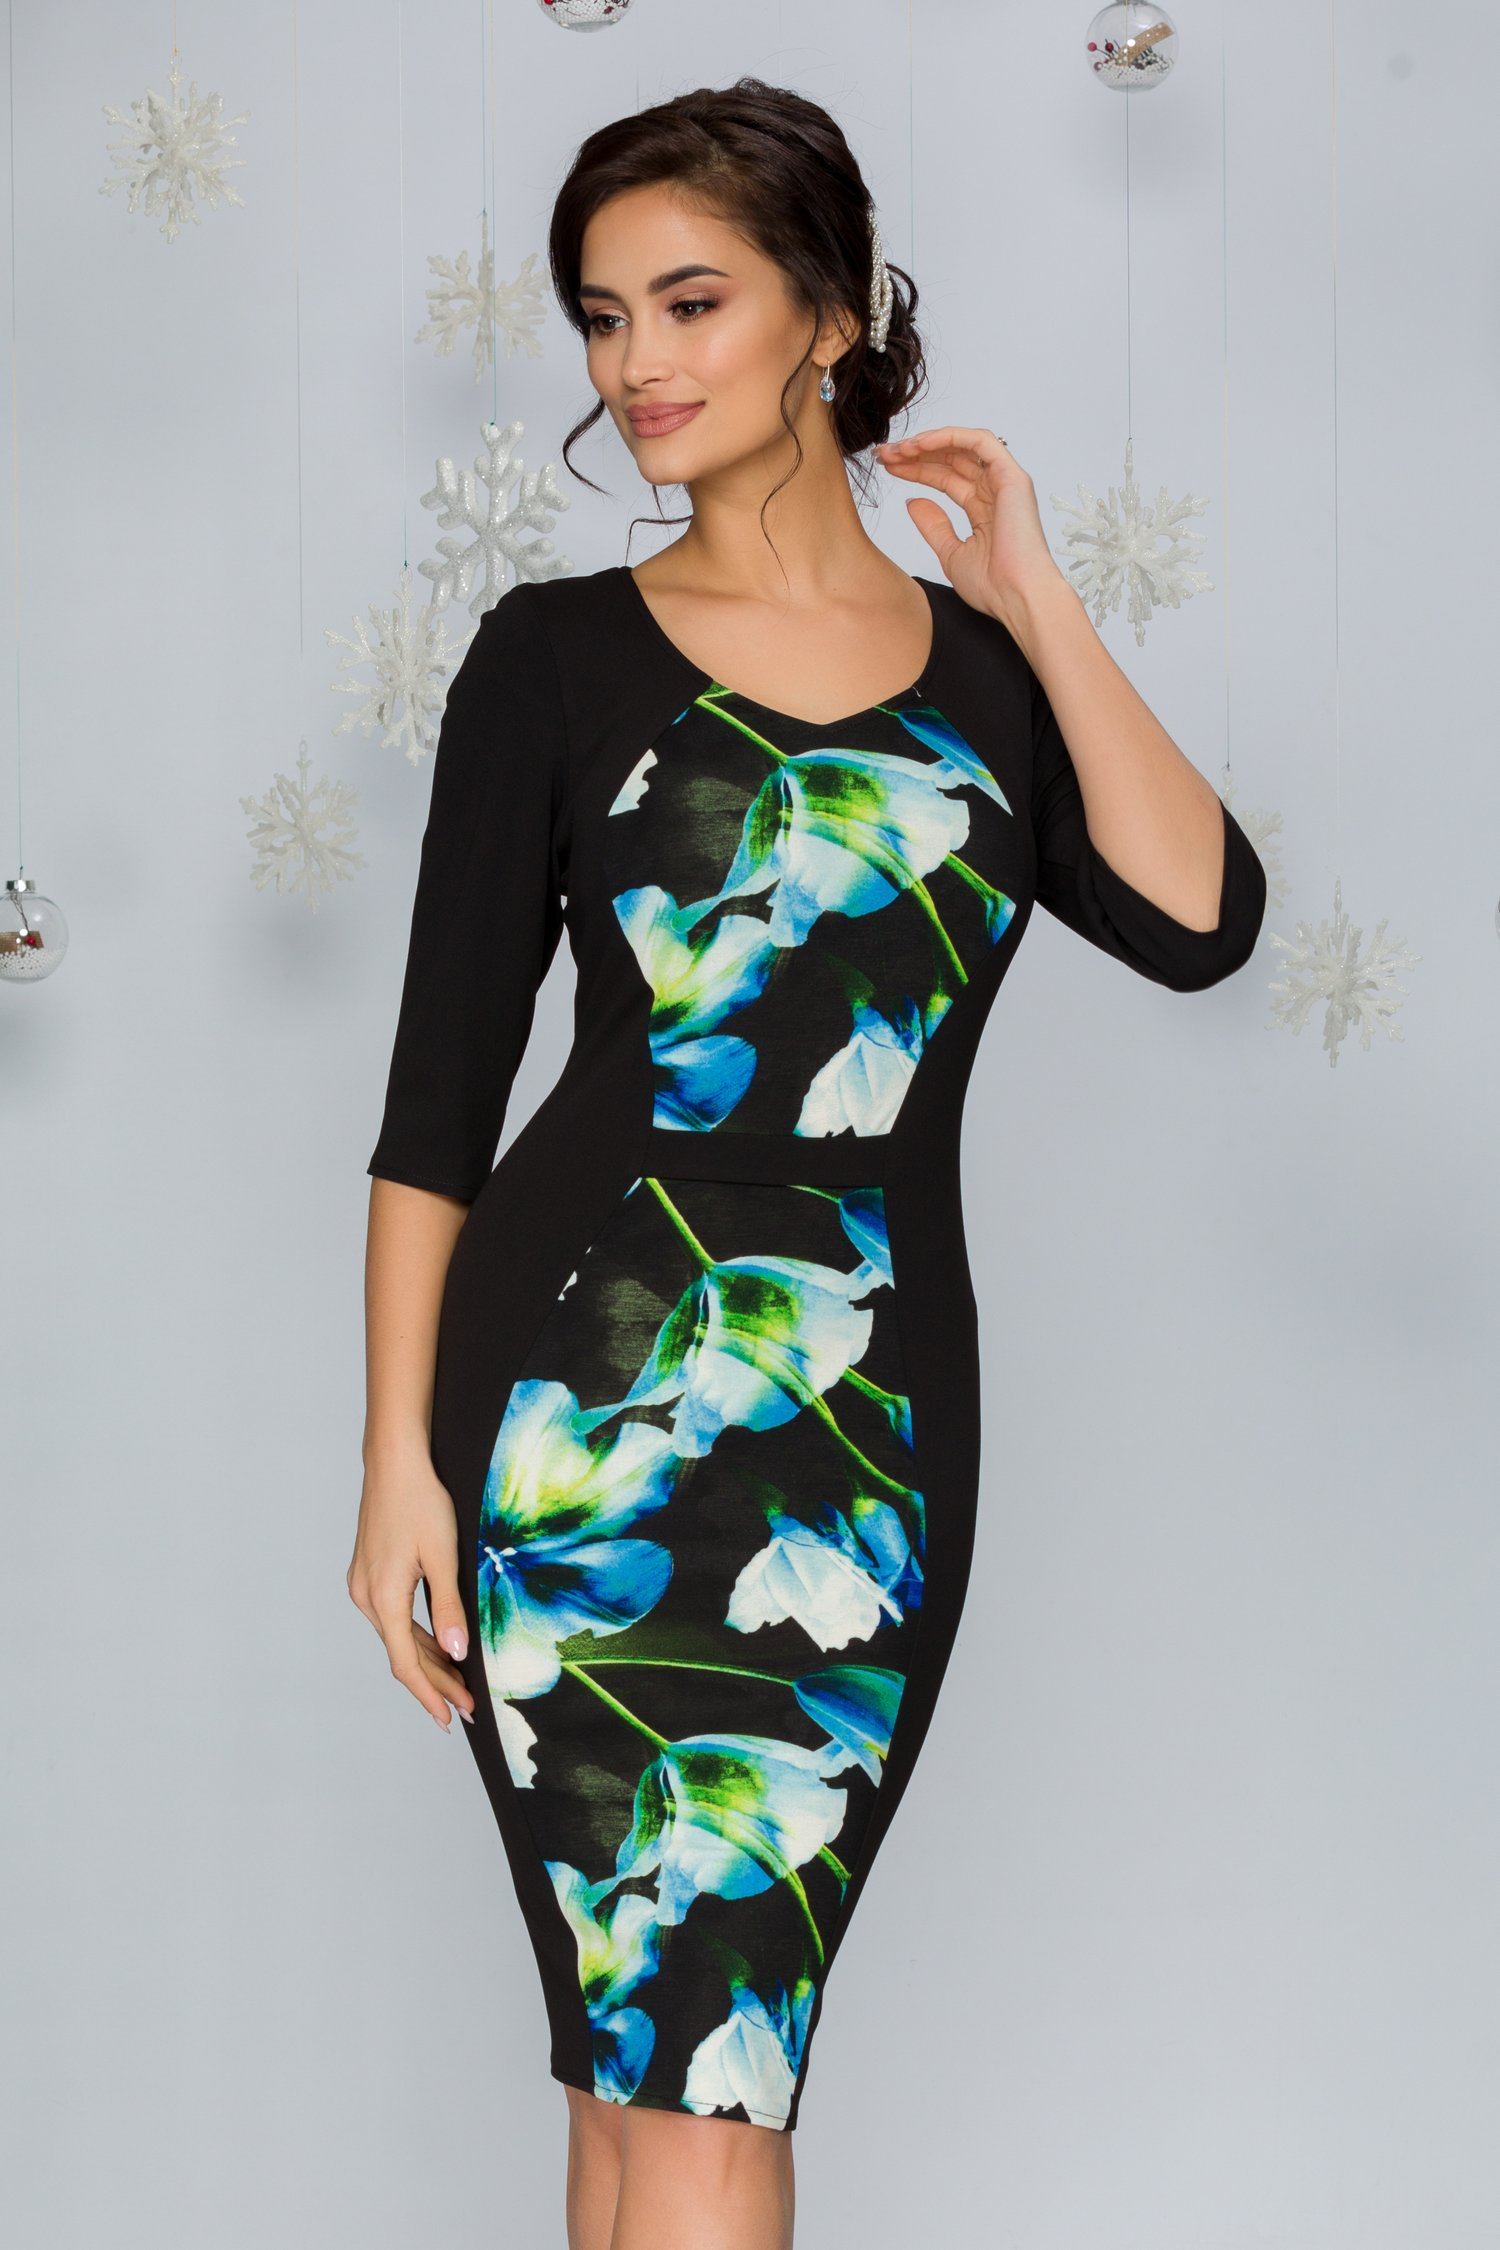 Rochie Yelta neagra cu flori albastre